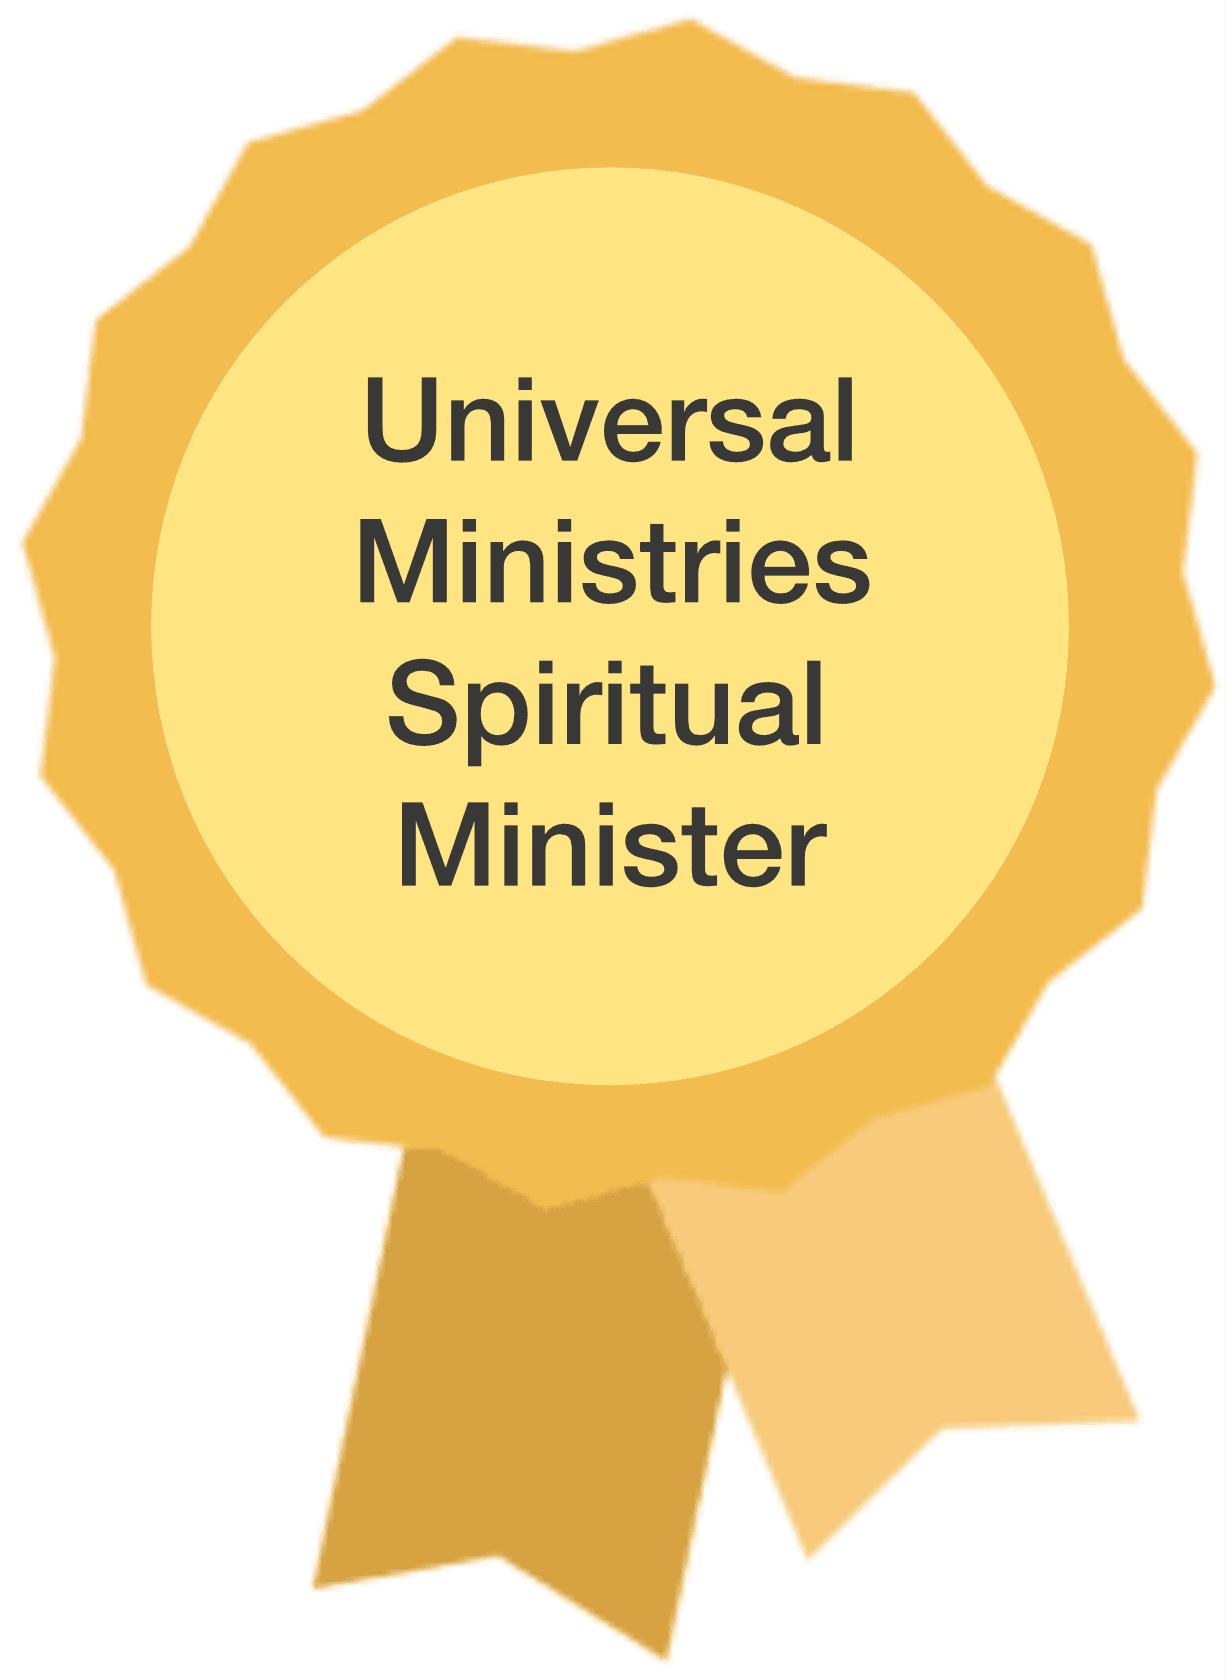 universal-ministries-spiritual-minister